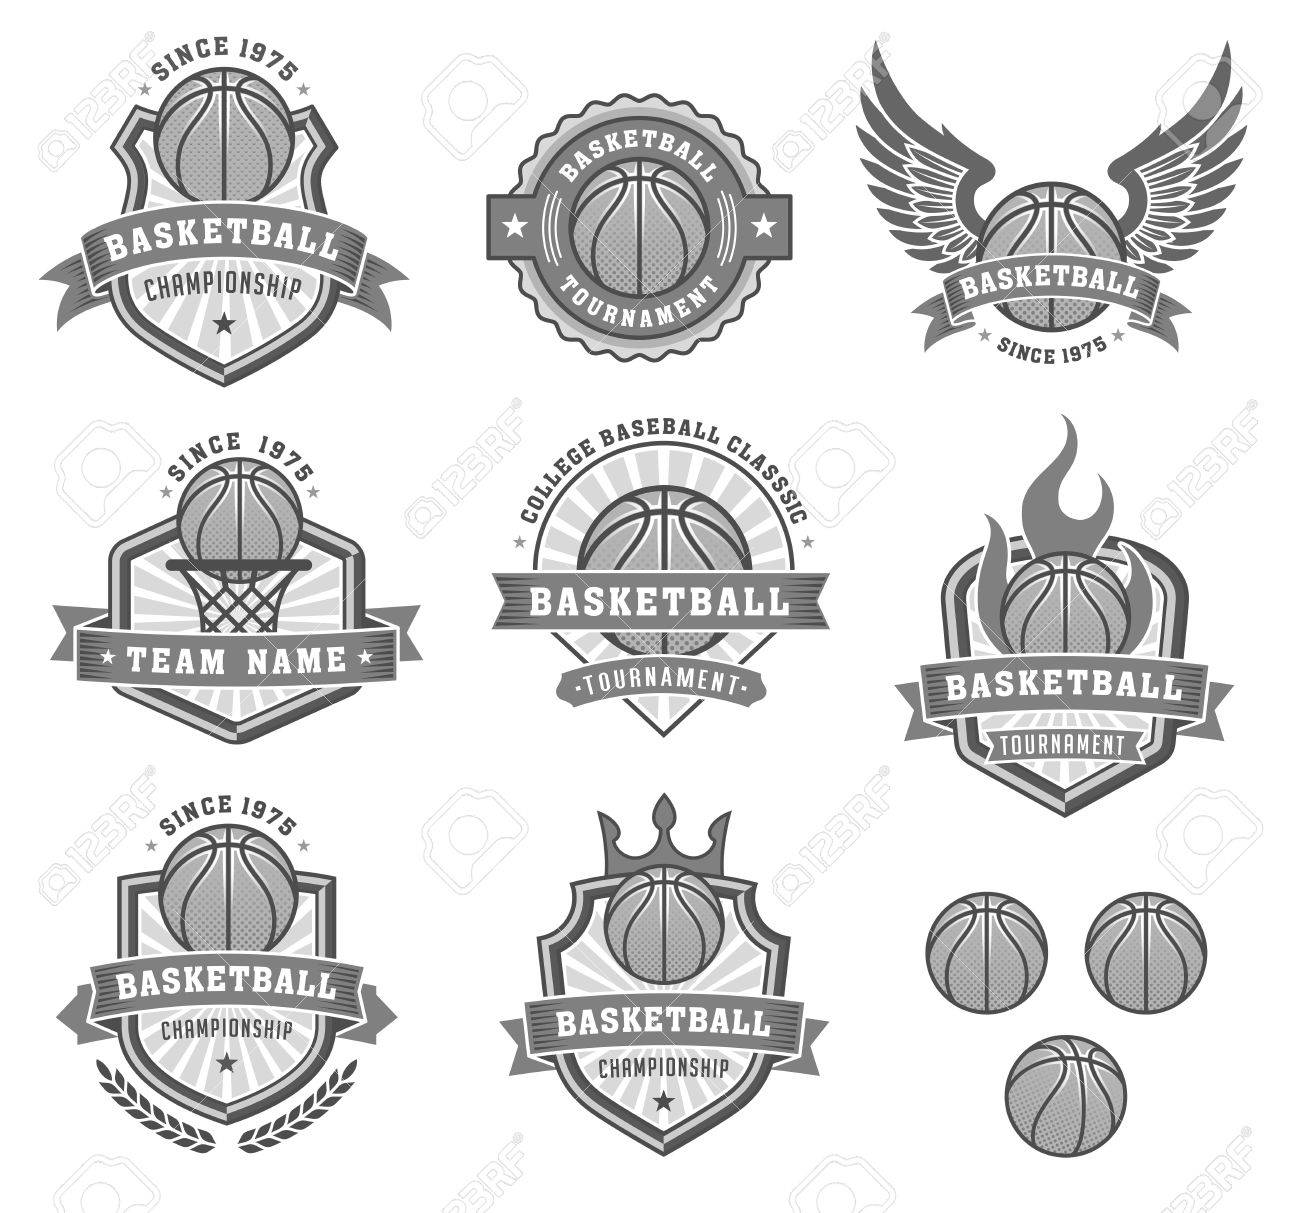 Fein Basketball Ball Malvorlagen Fotos - Entry Level Resume Vorlagen ...